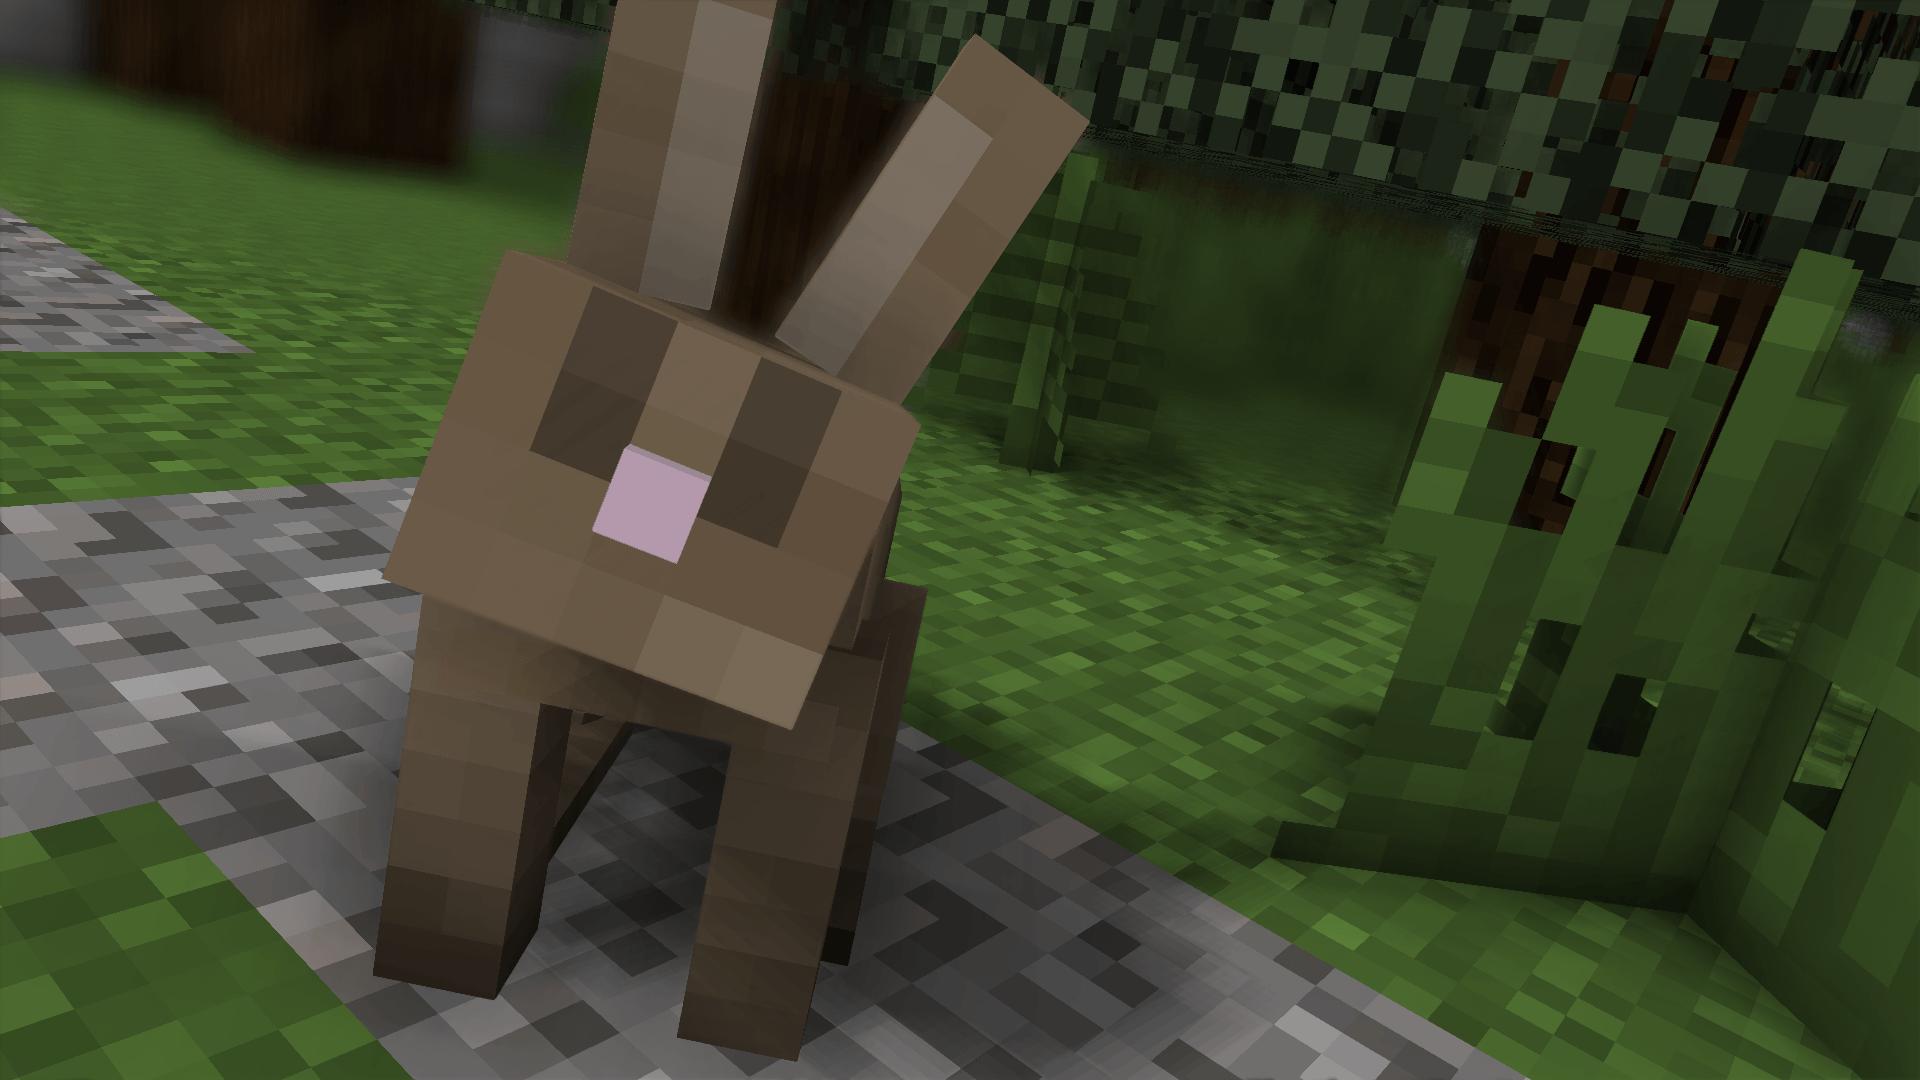 Un lapin tout mignon, un Wallpaper de GreenLenux